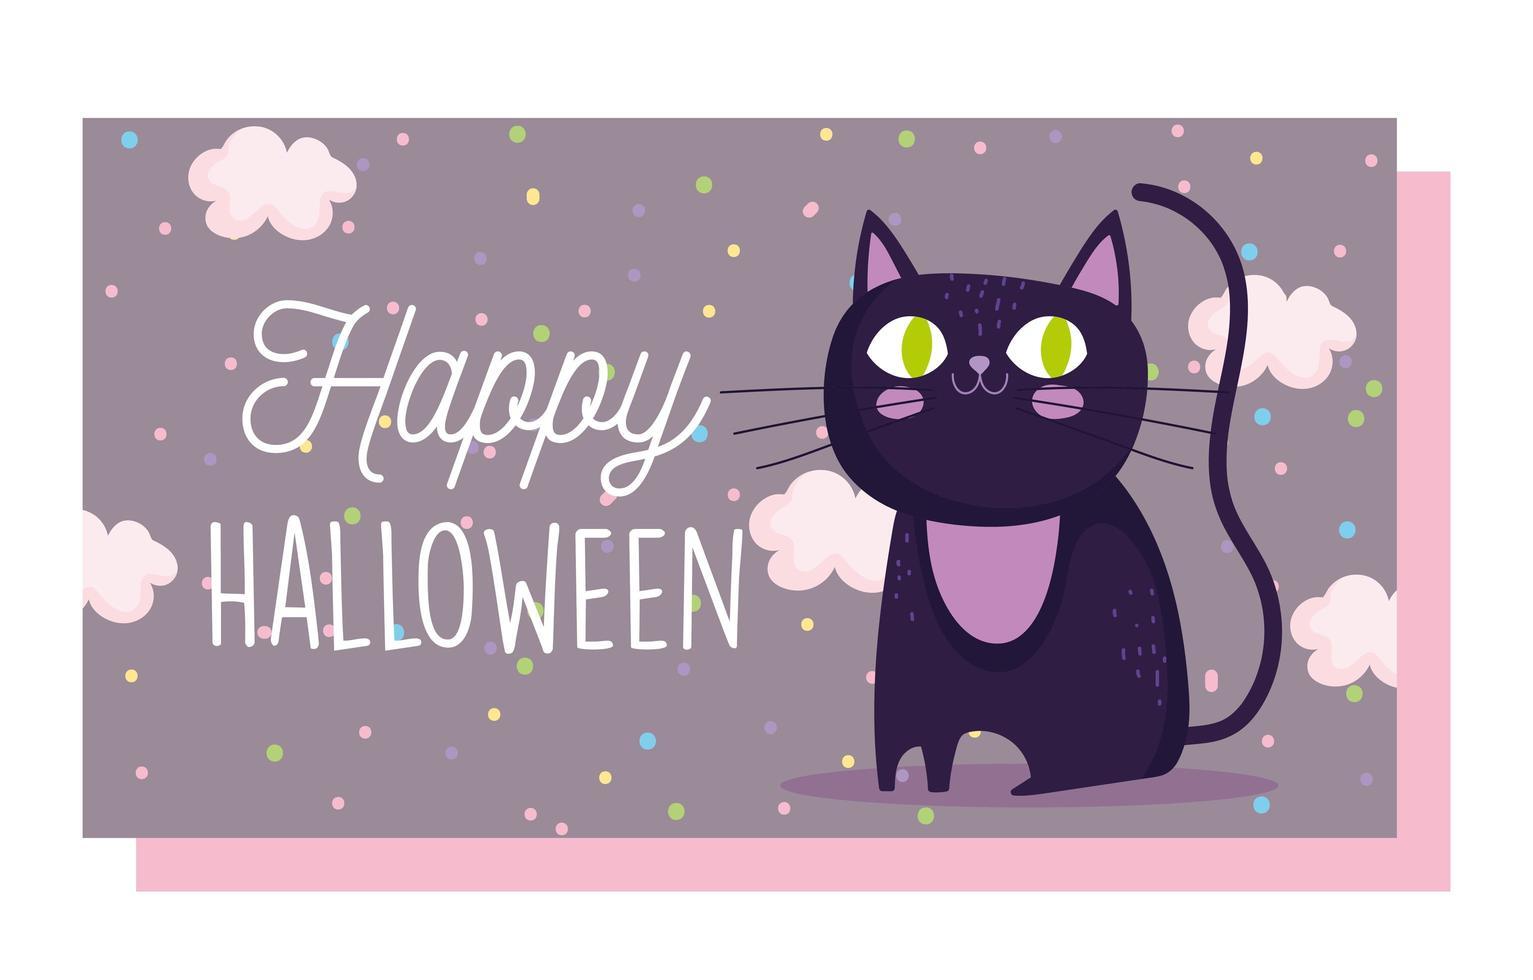 feliz dia das bruxas, desenho bonito de gato preto vetor